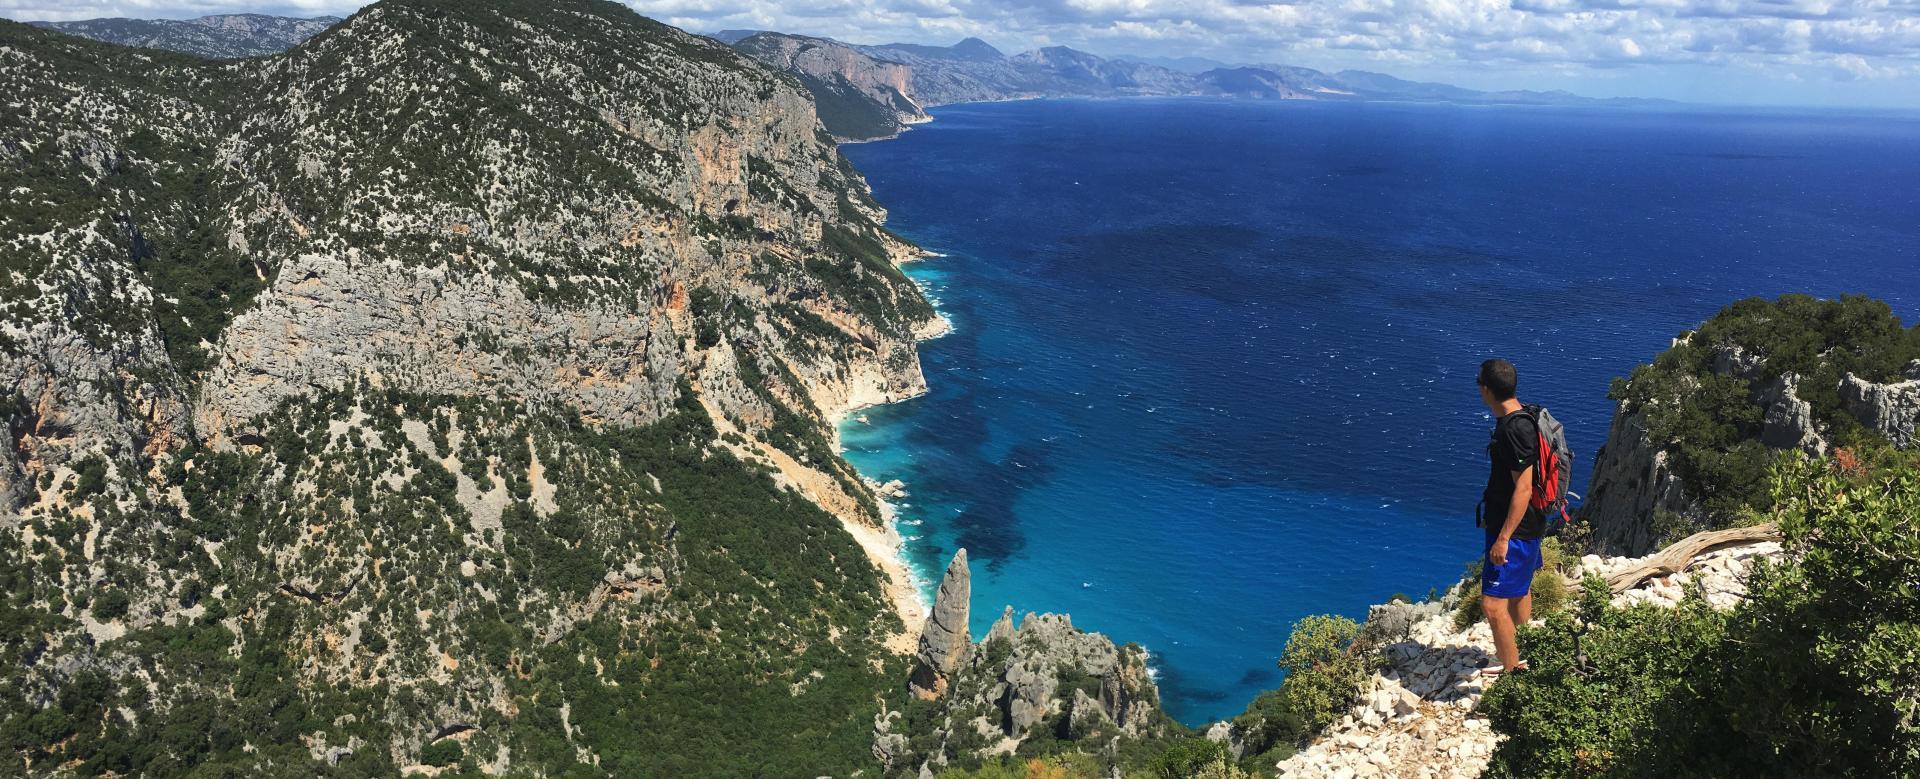 Voyage à pied : Sardaigne : Le trail du selvaggio blu